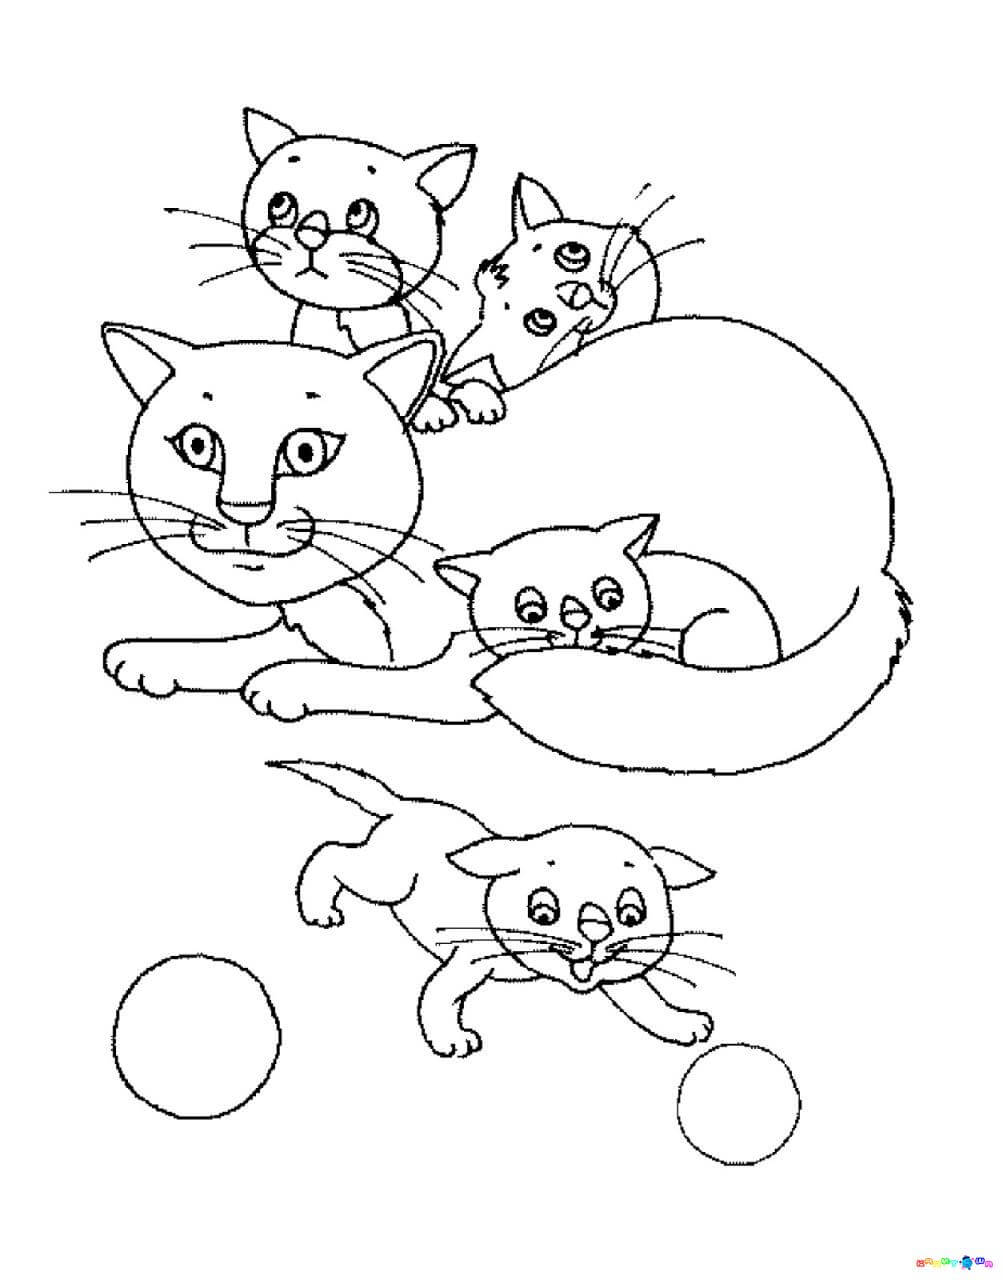 Anak Kucing Mencetak Cetakan Lucu Imut